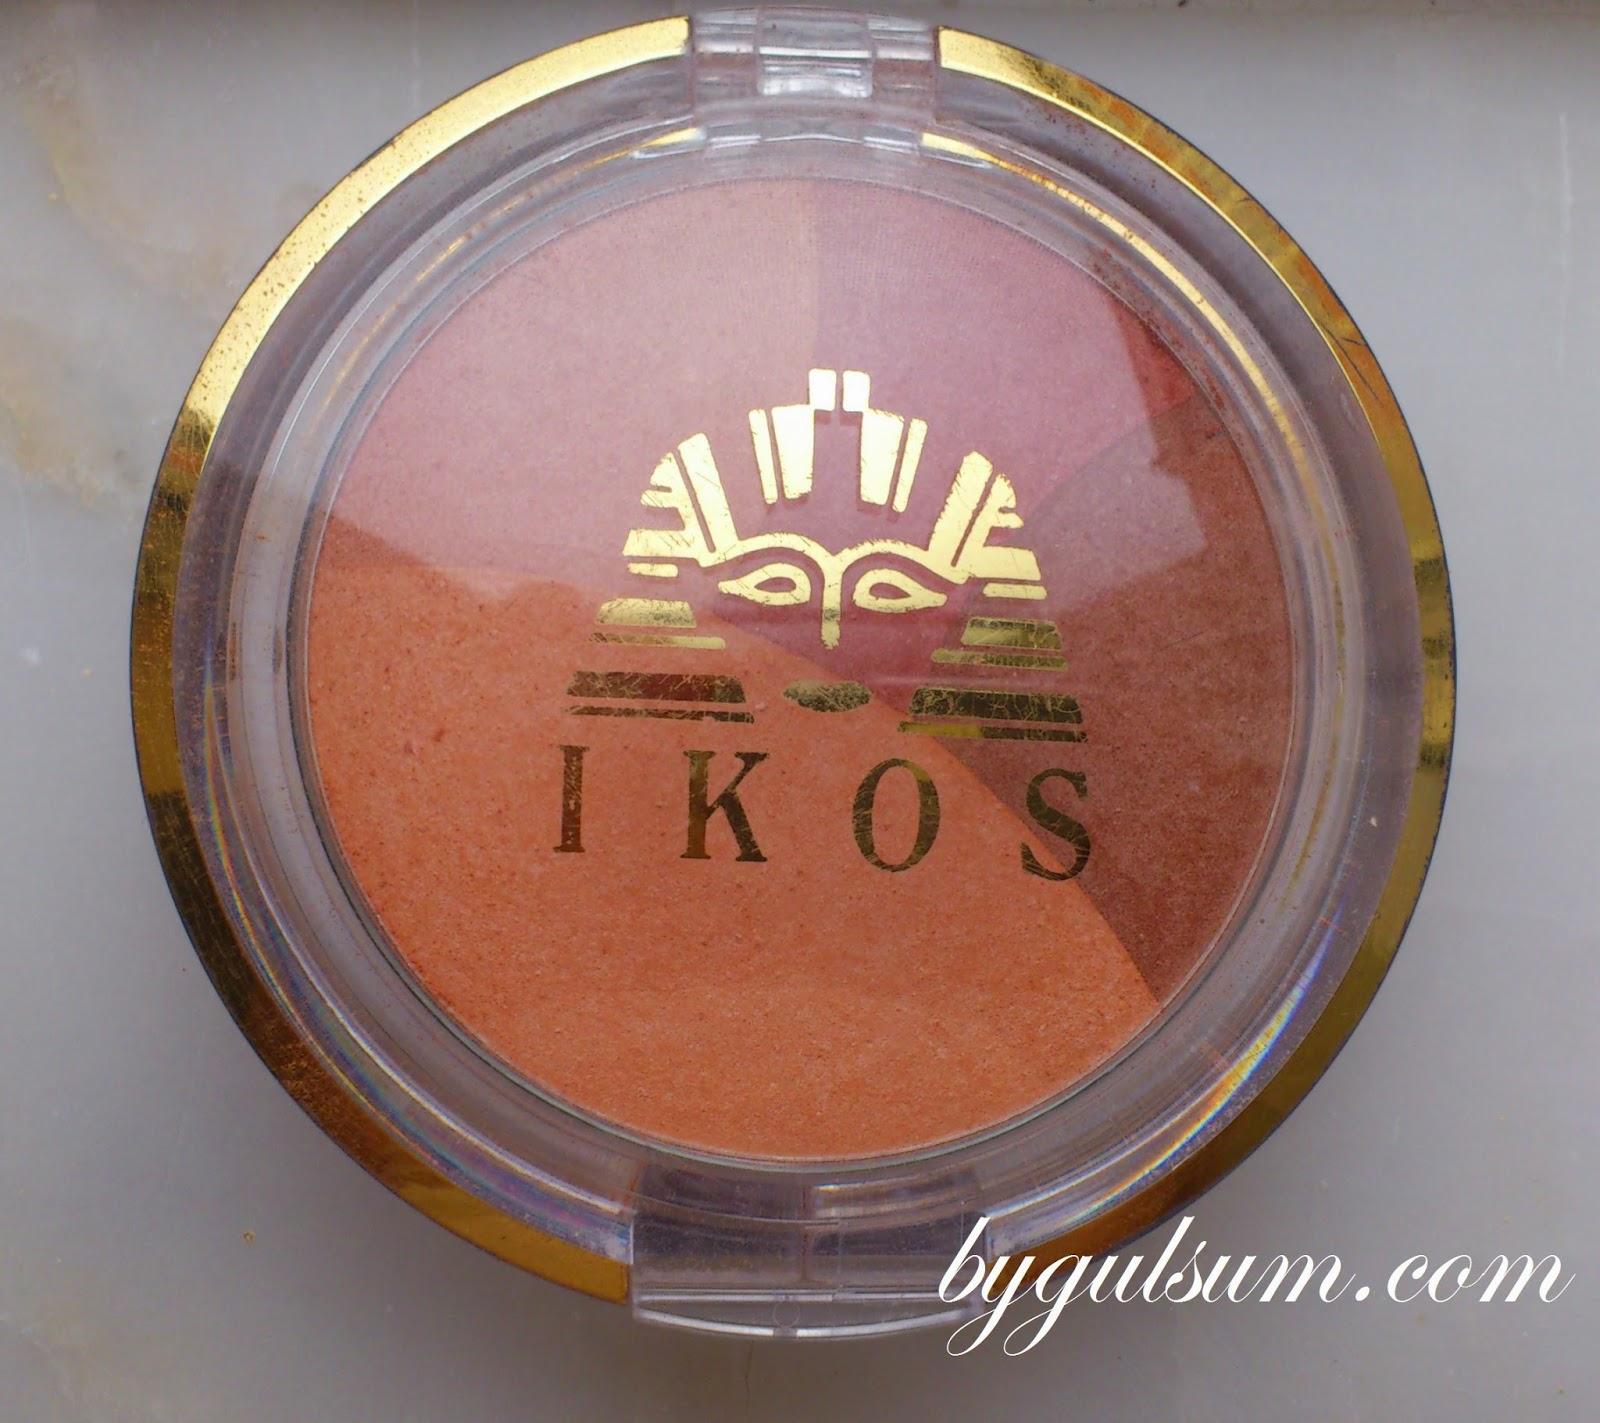 IKOS 4 Renkli Allık